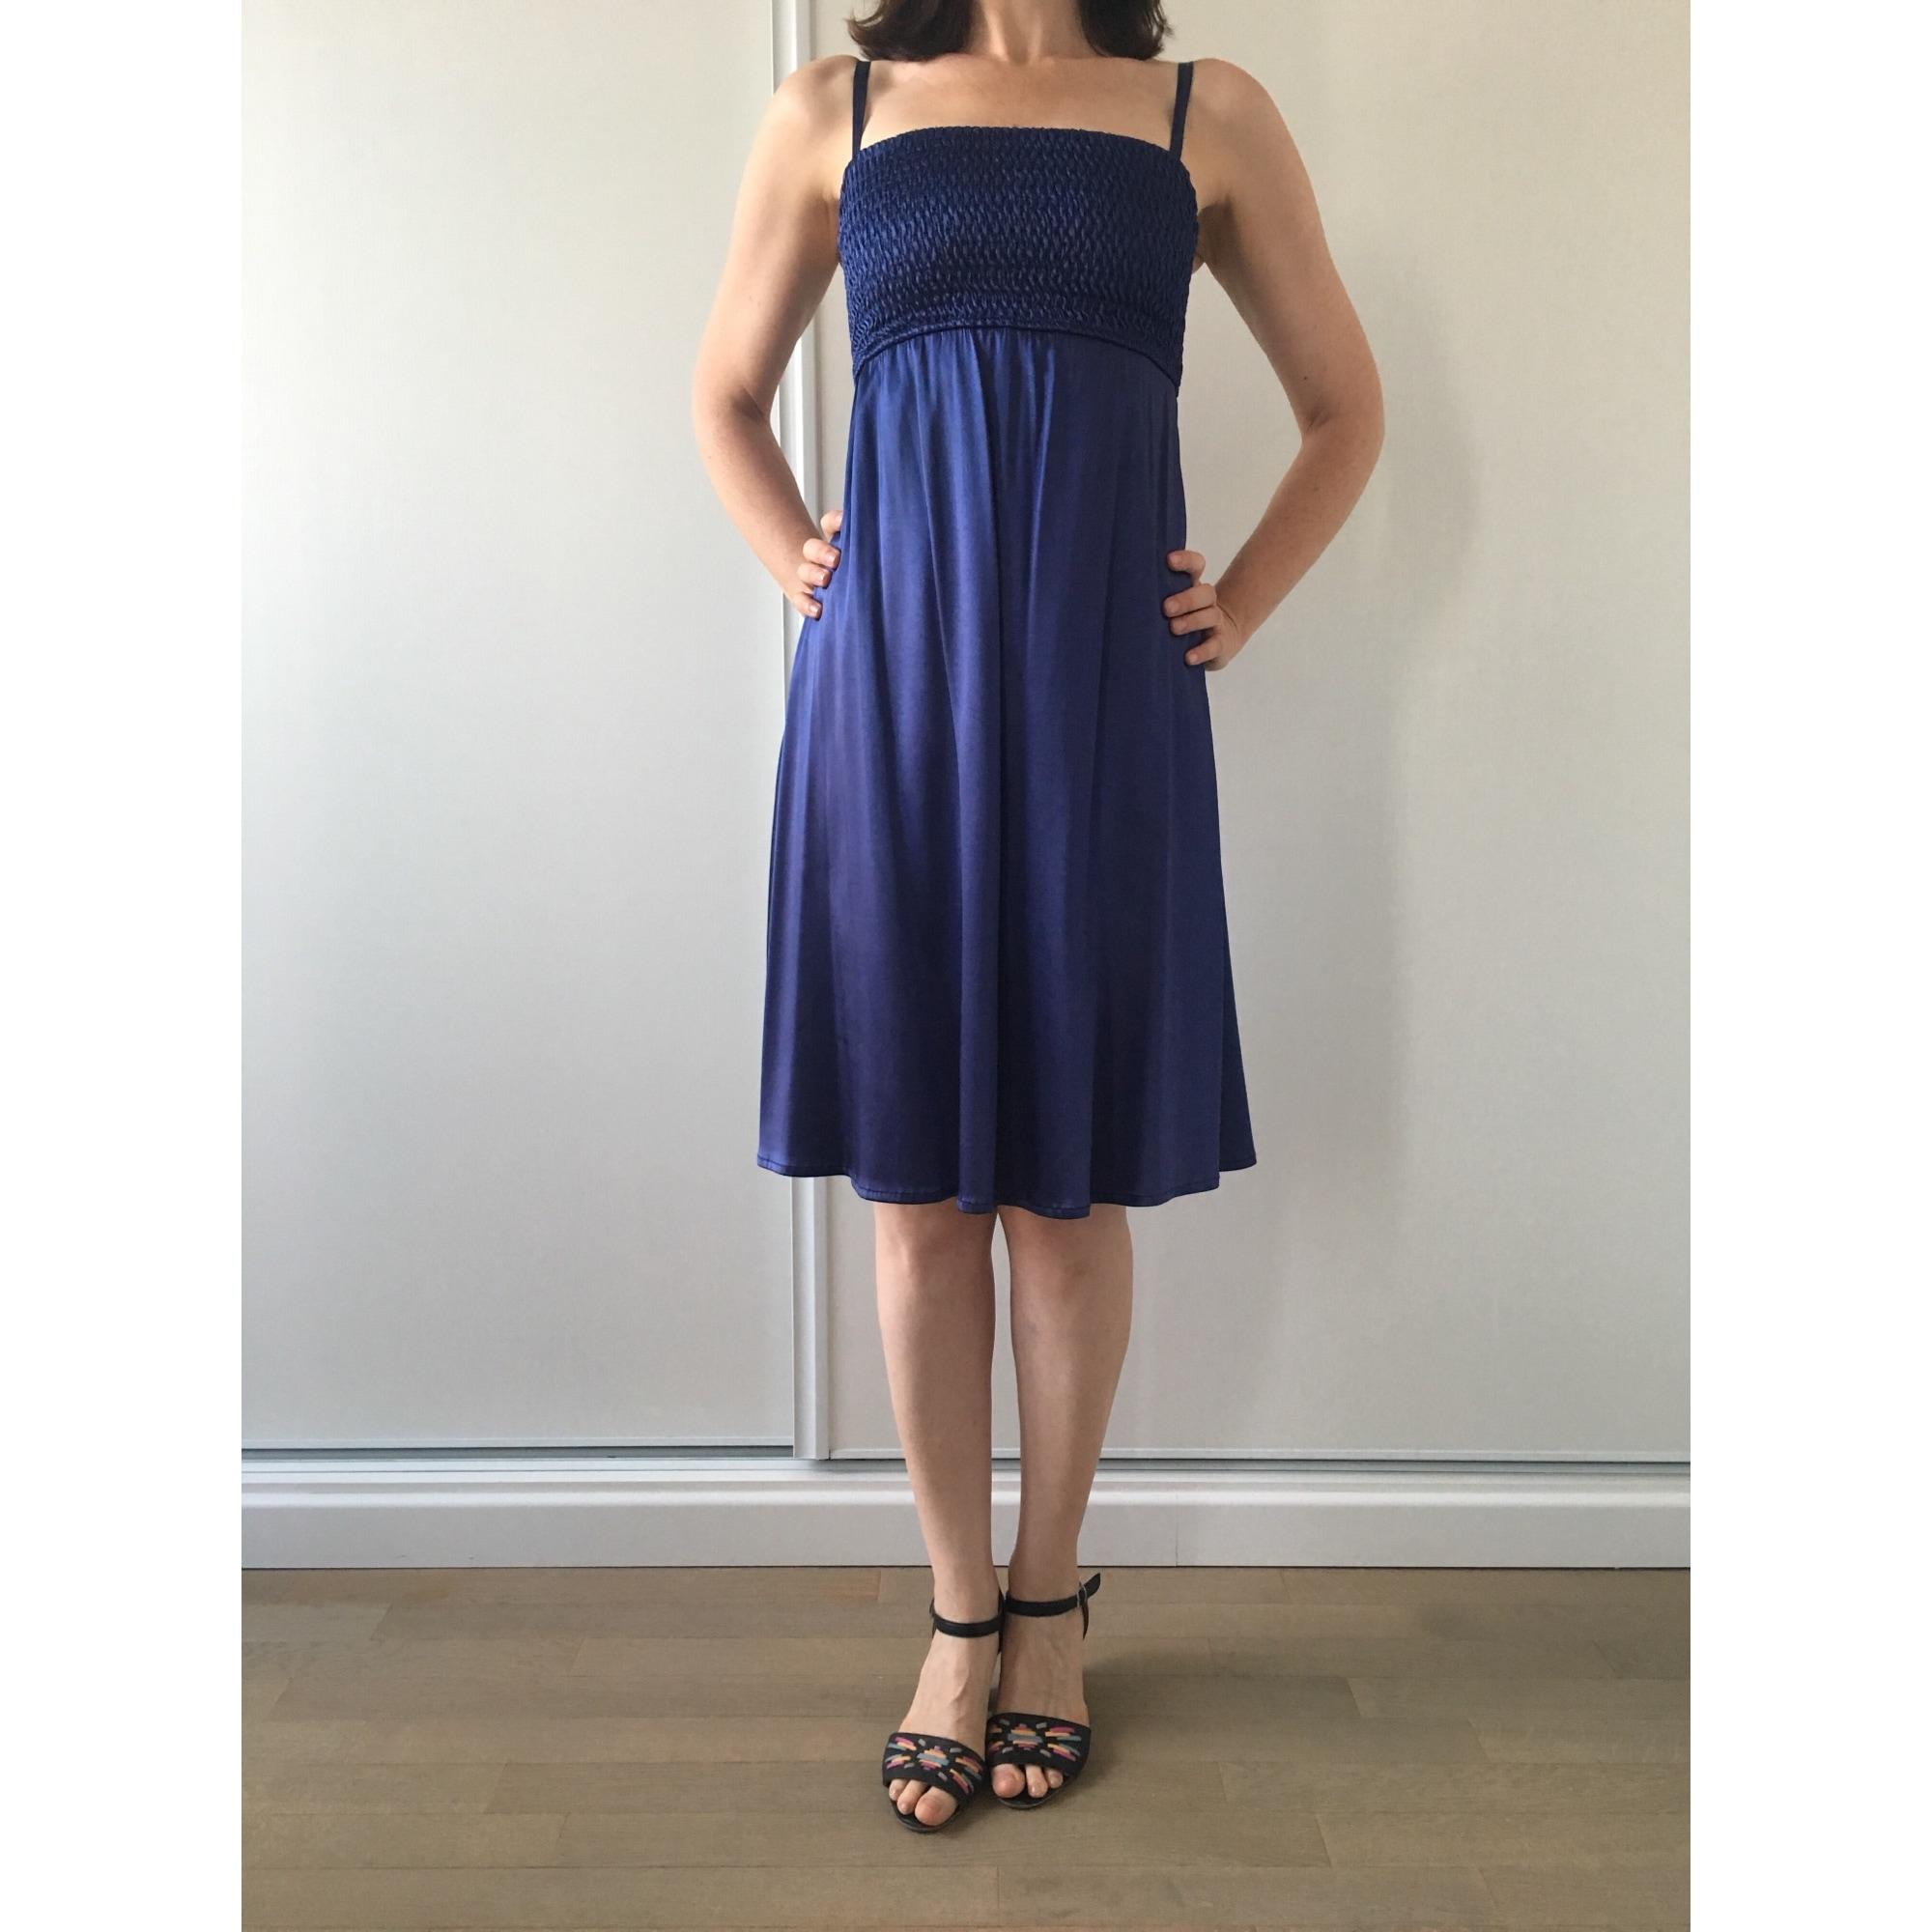 Robe mi-longue WHO'S WHO Bleu, bleu marine, bleu turquoise